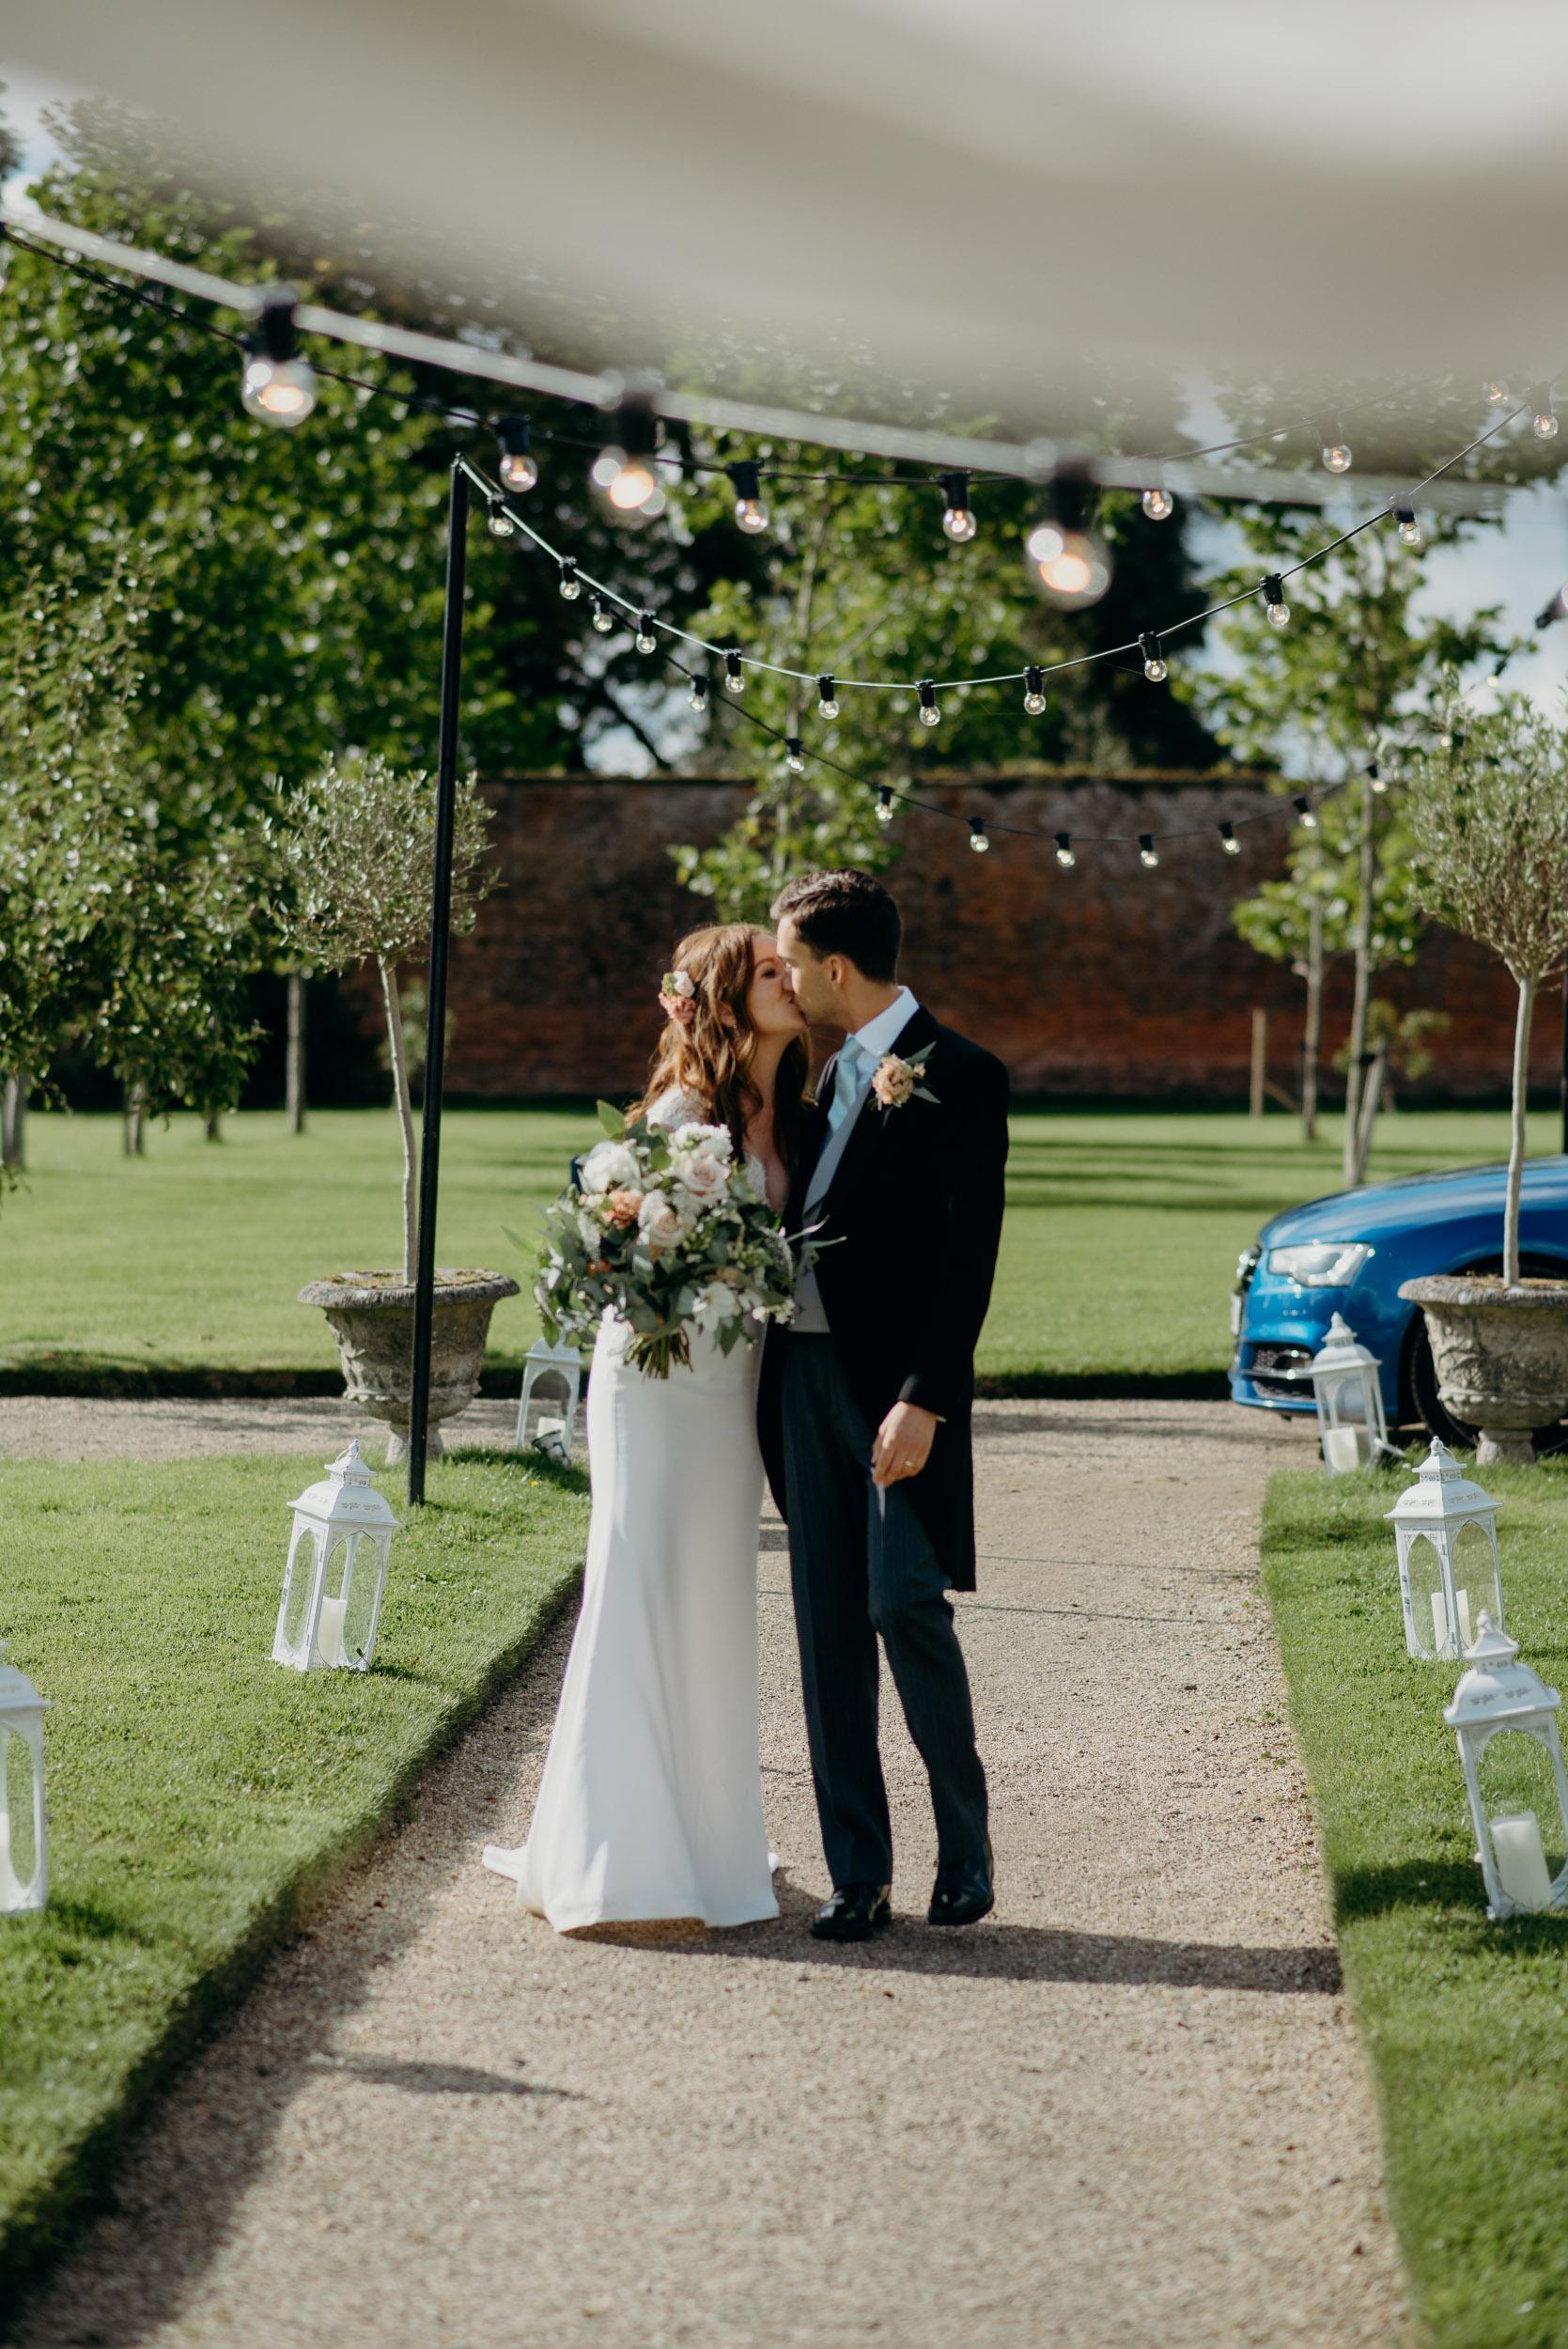 drenagh estate wedding photography-103.jpg